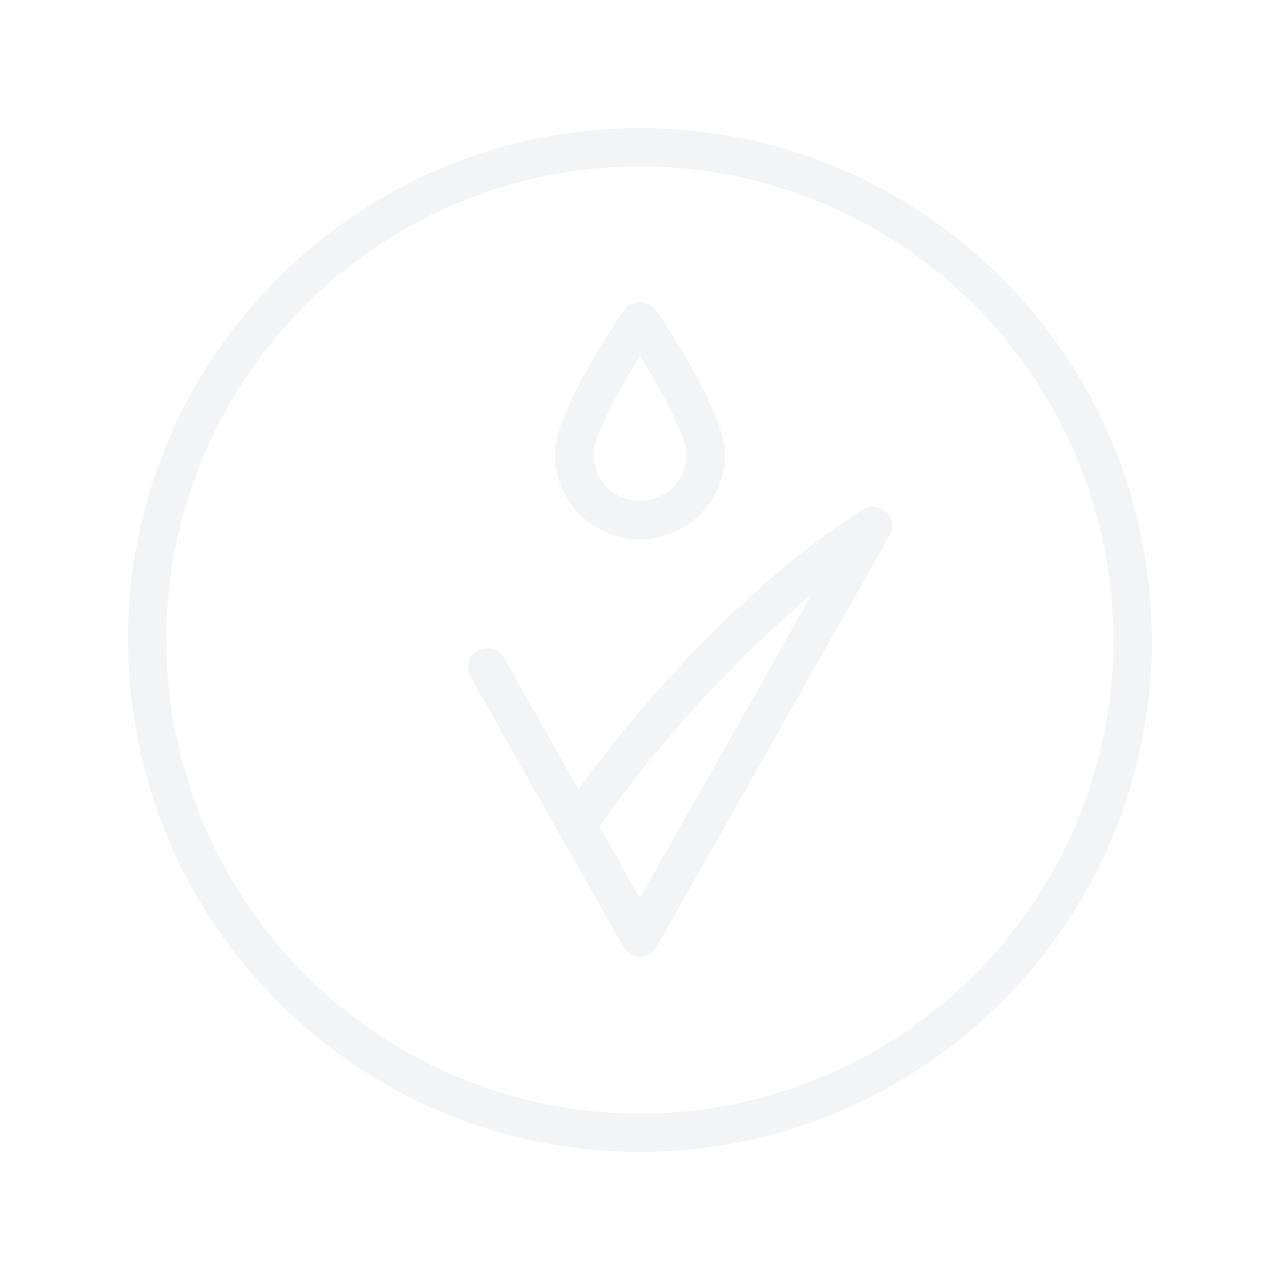 Clarins Moisture-Rich Body Lotion 400ml